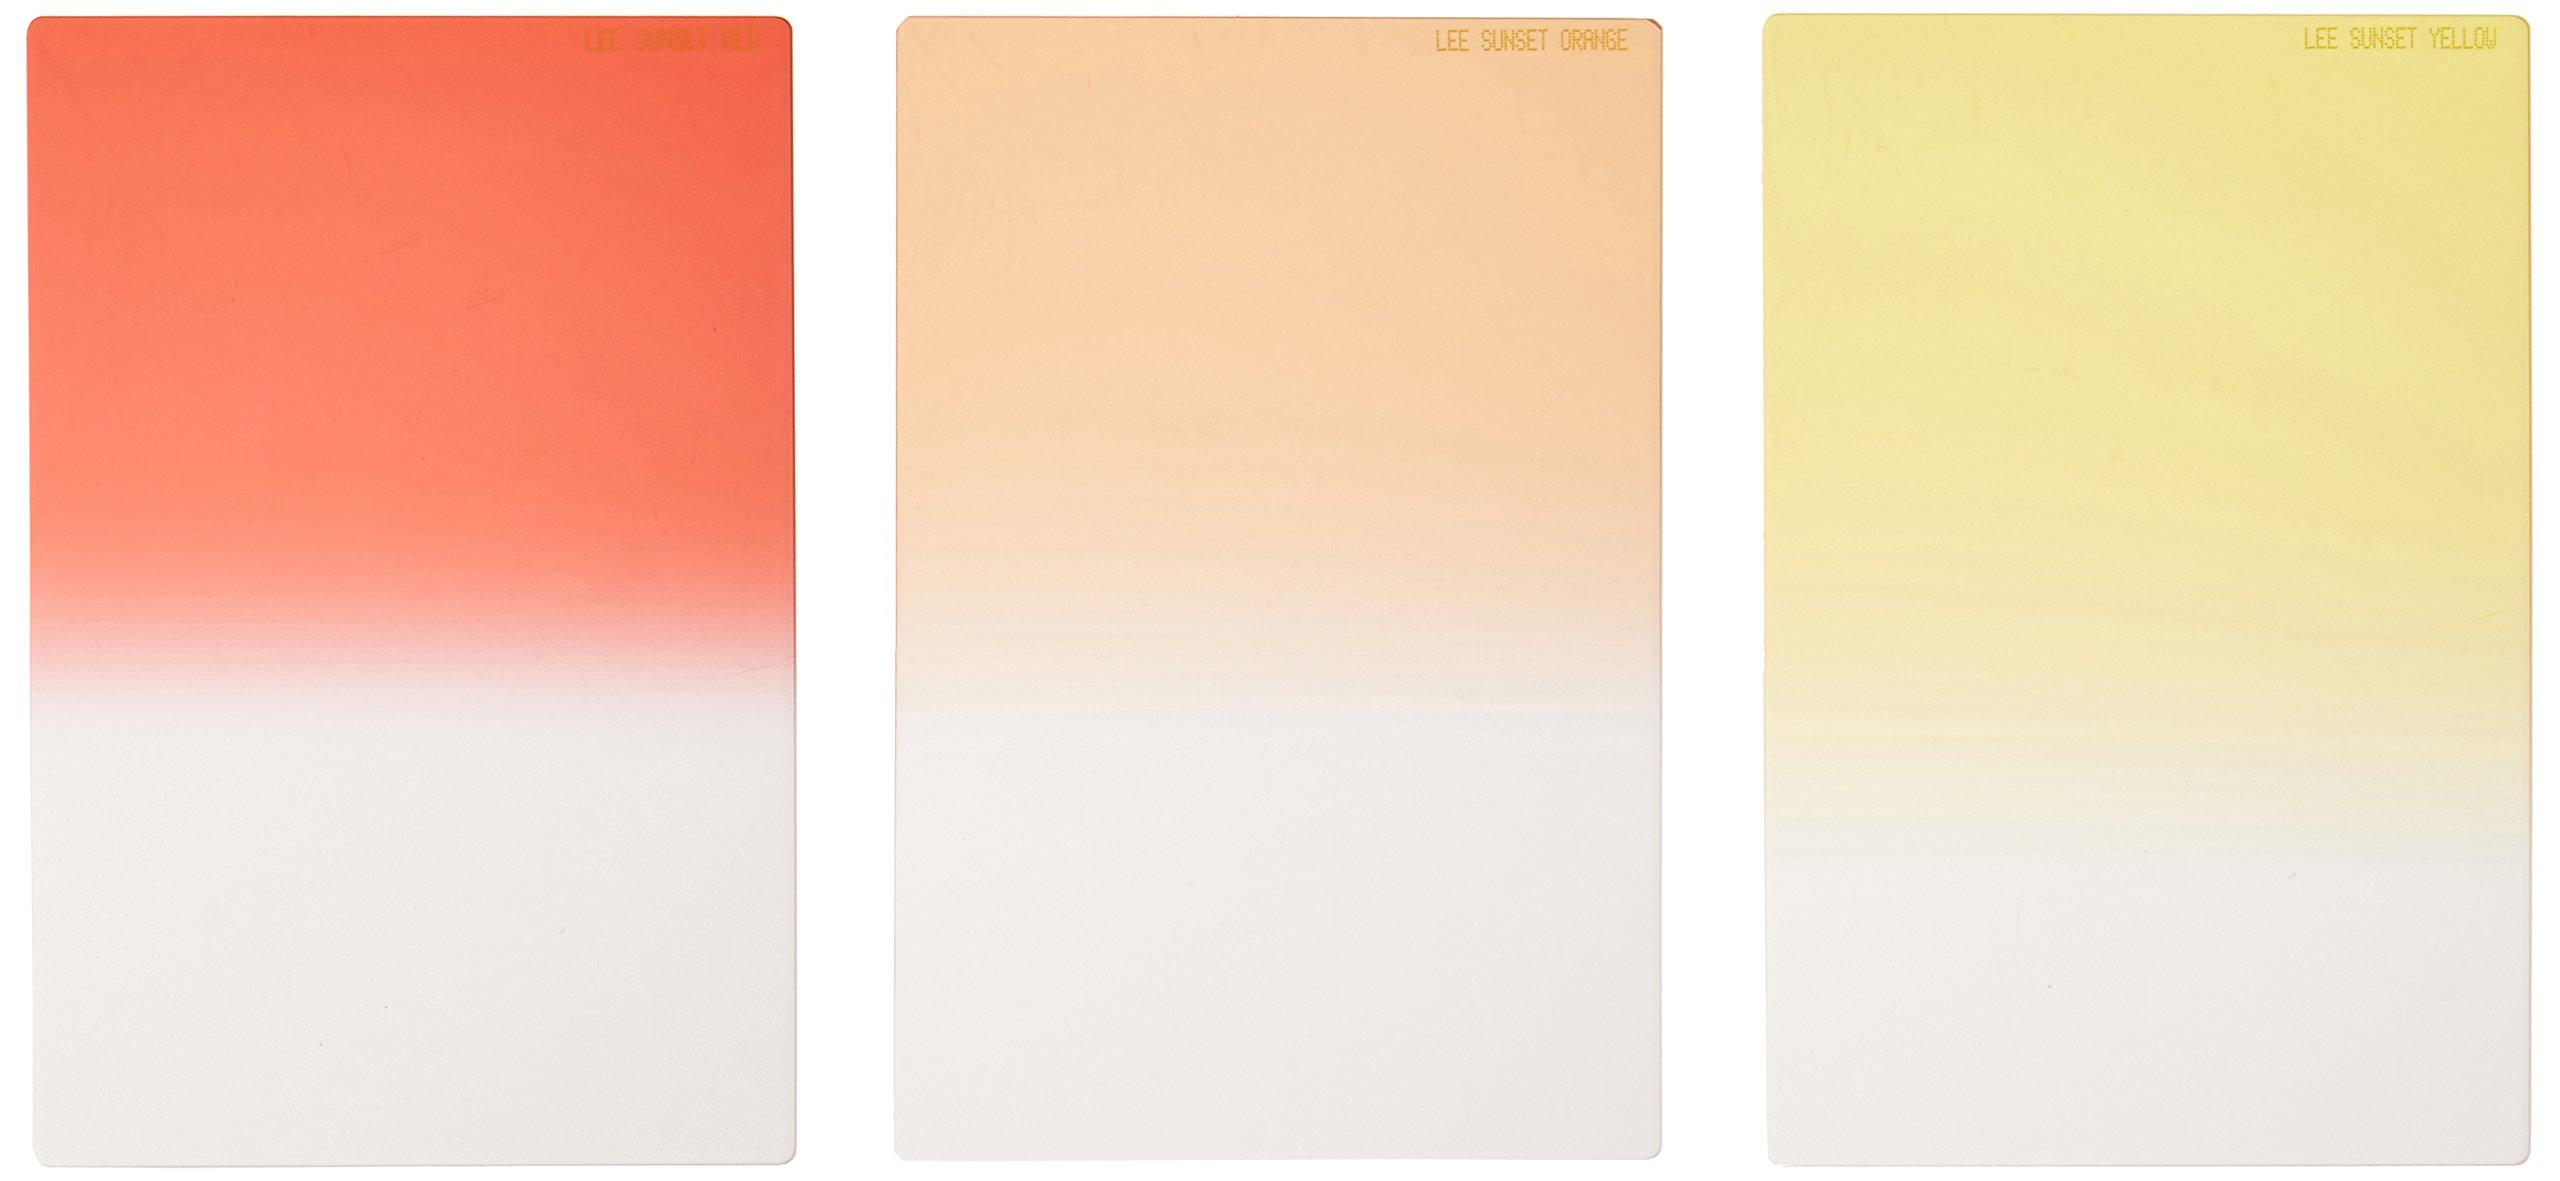 Lee Sunset Filter Graduated Set (100x150mm Resin) [FHSUNS ]